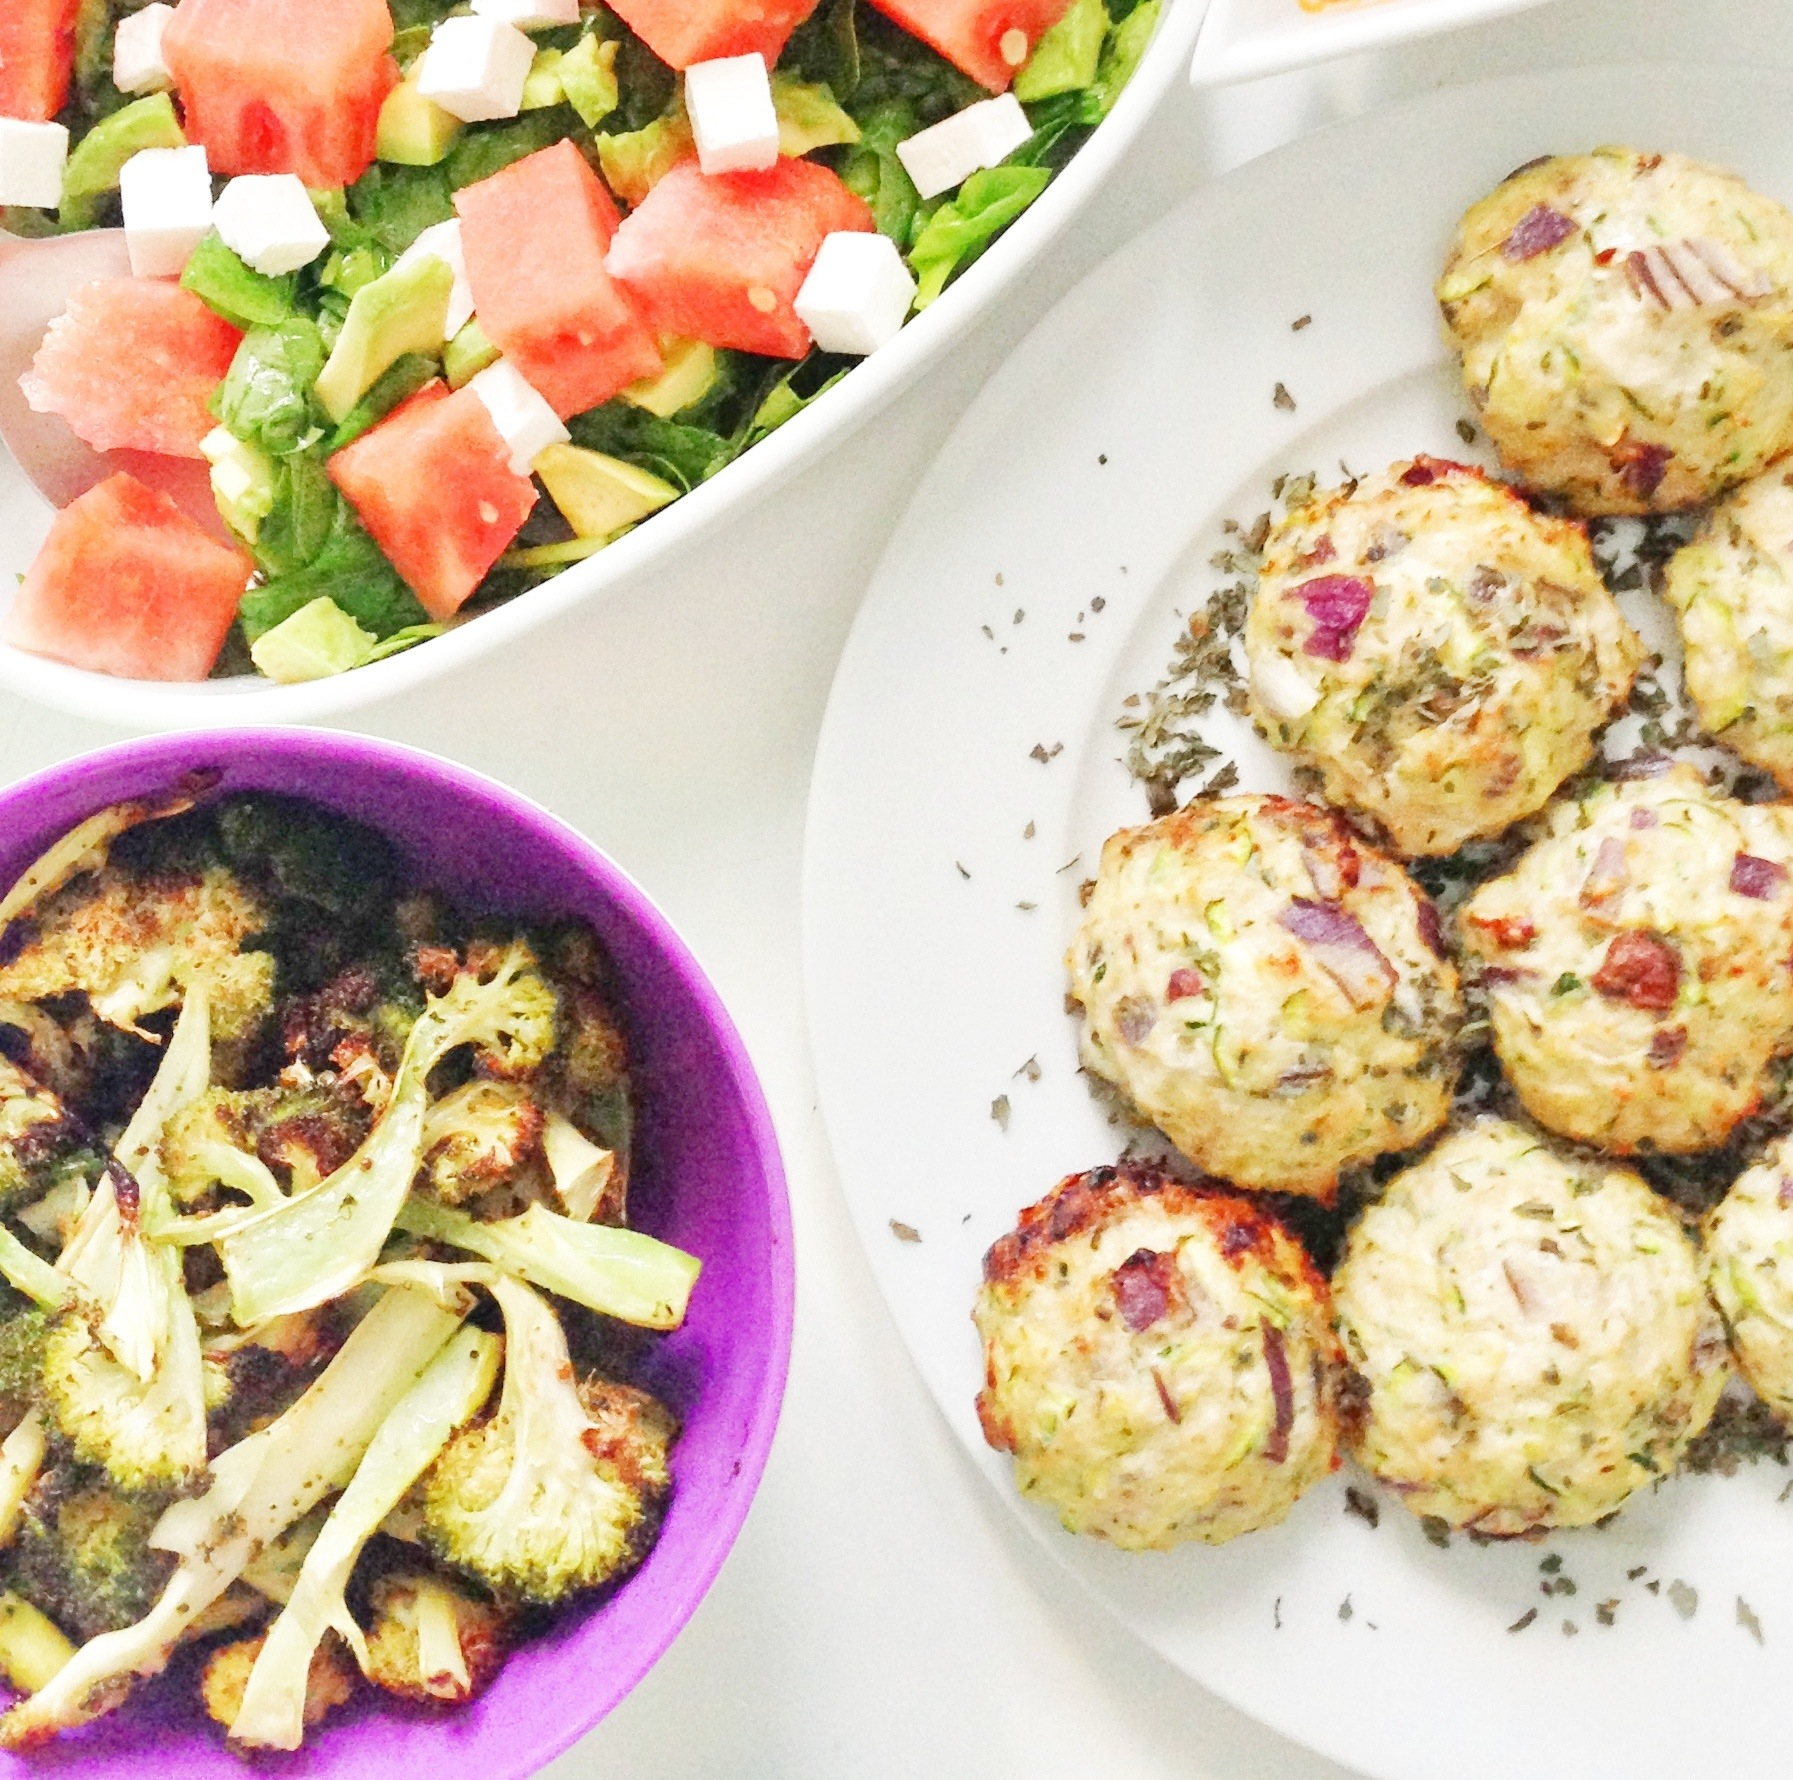 hjemmelavede frikadeller med kylling og nødder og squash. Sunde frikadeller som er nem hverdagsmad